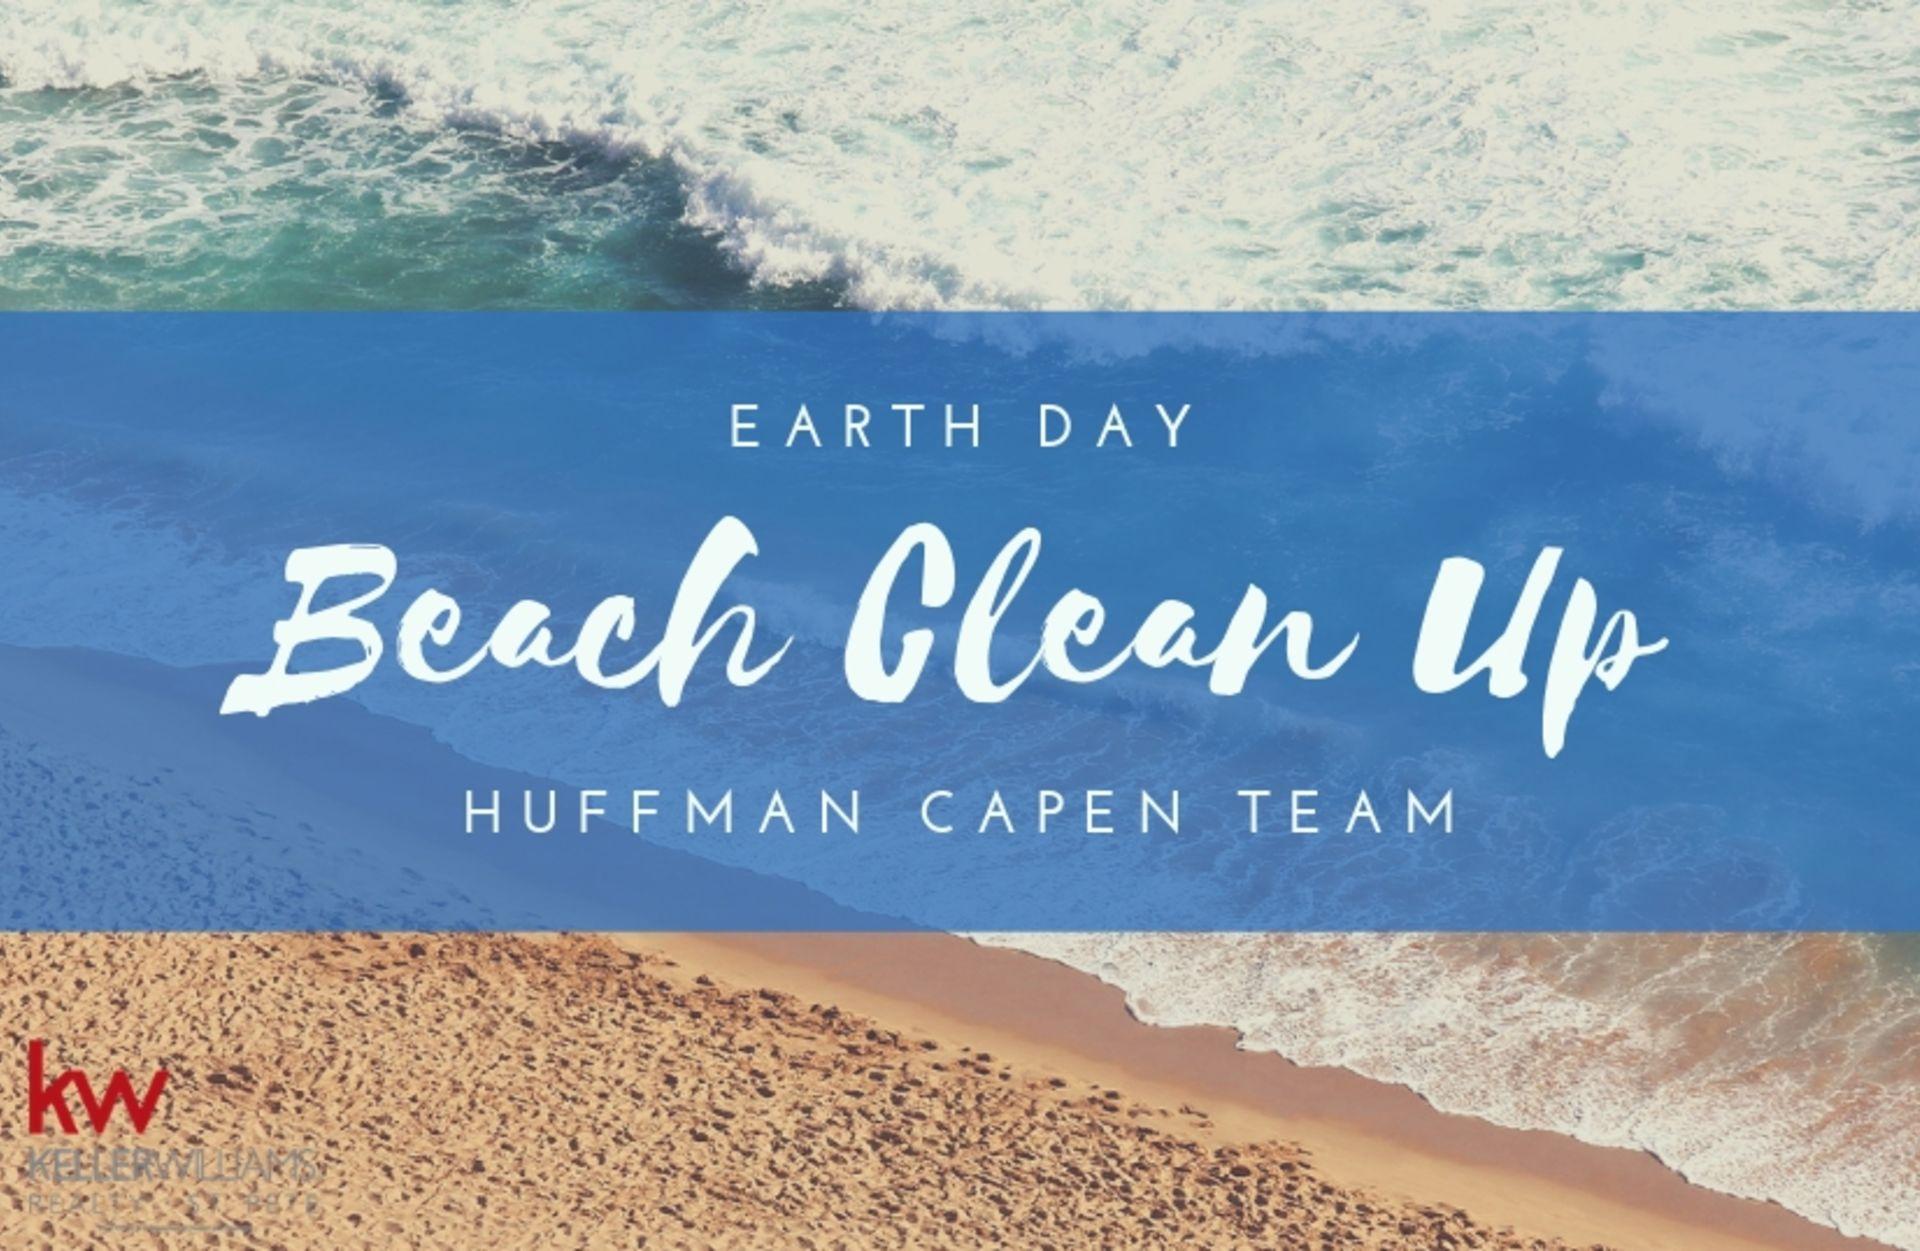 2nd Annual Earth Day Beach Clean Up